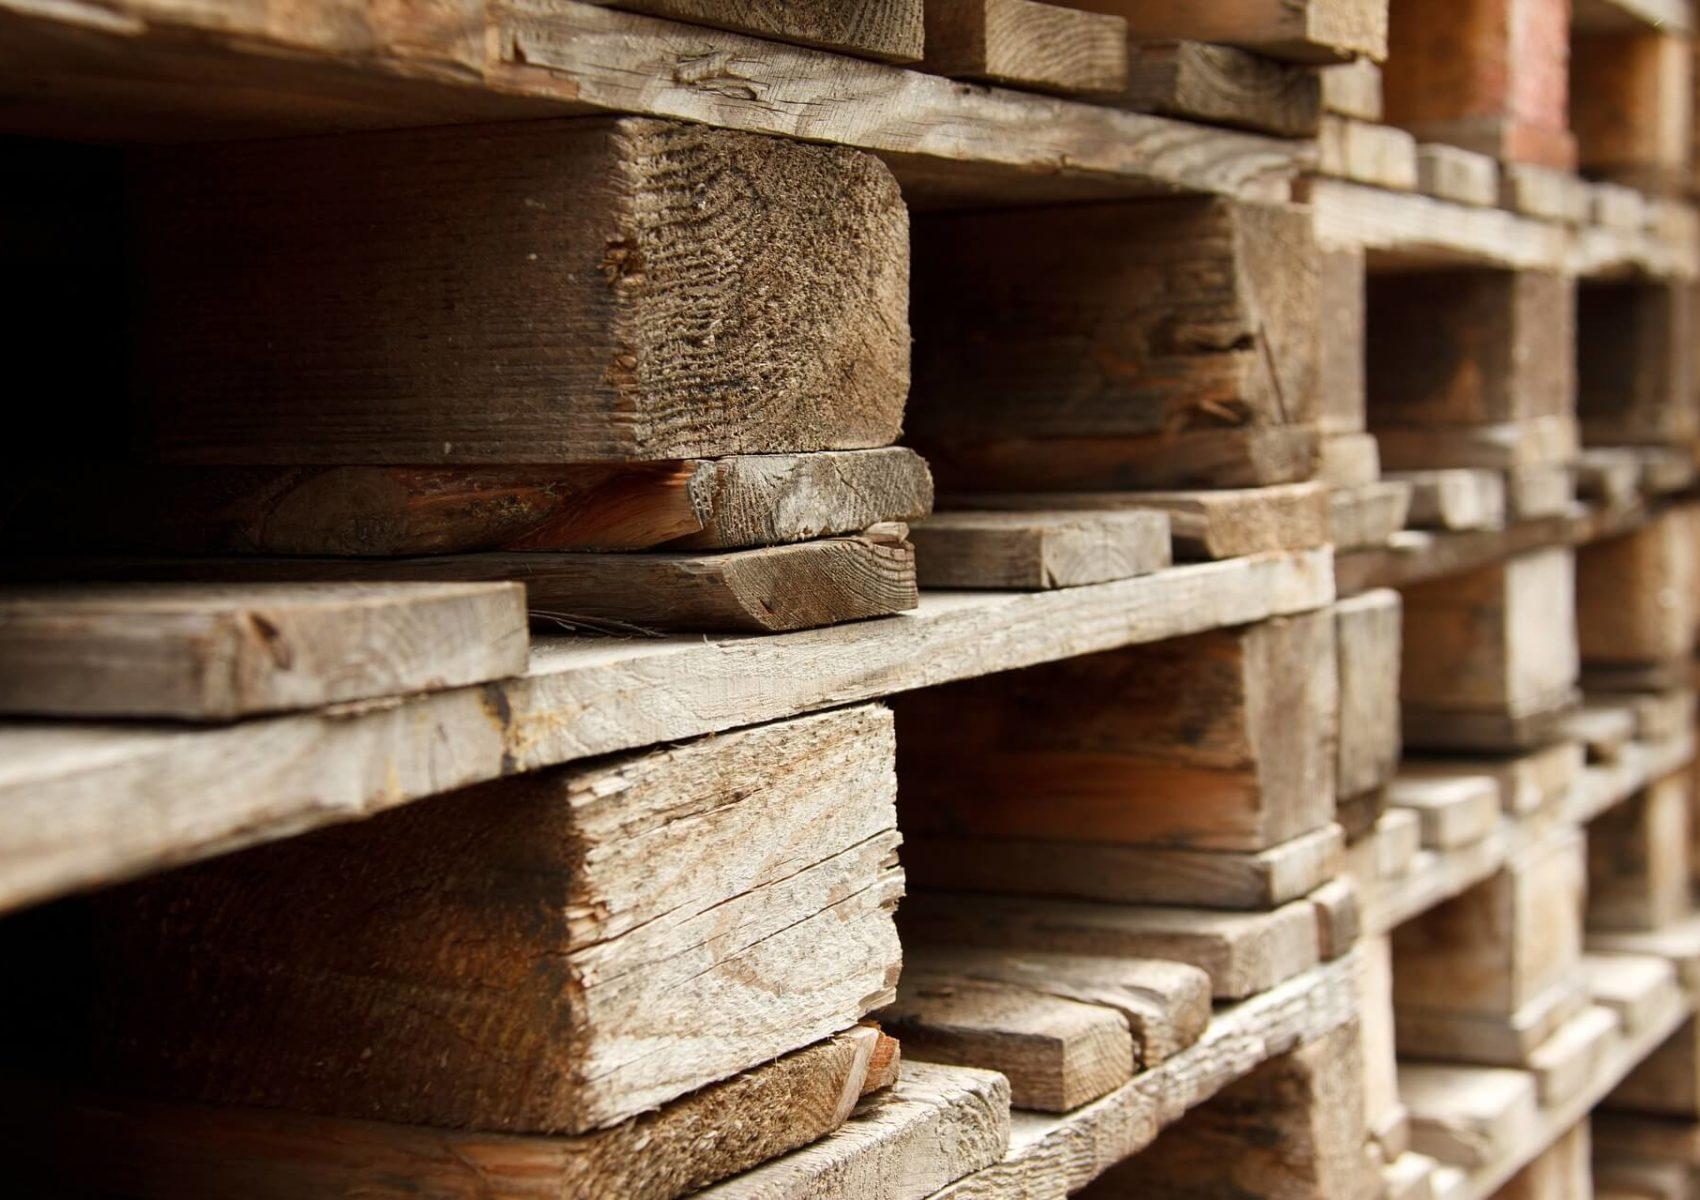 Gestion de stock, capacite levage max 8 tonnes Arlon